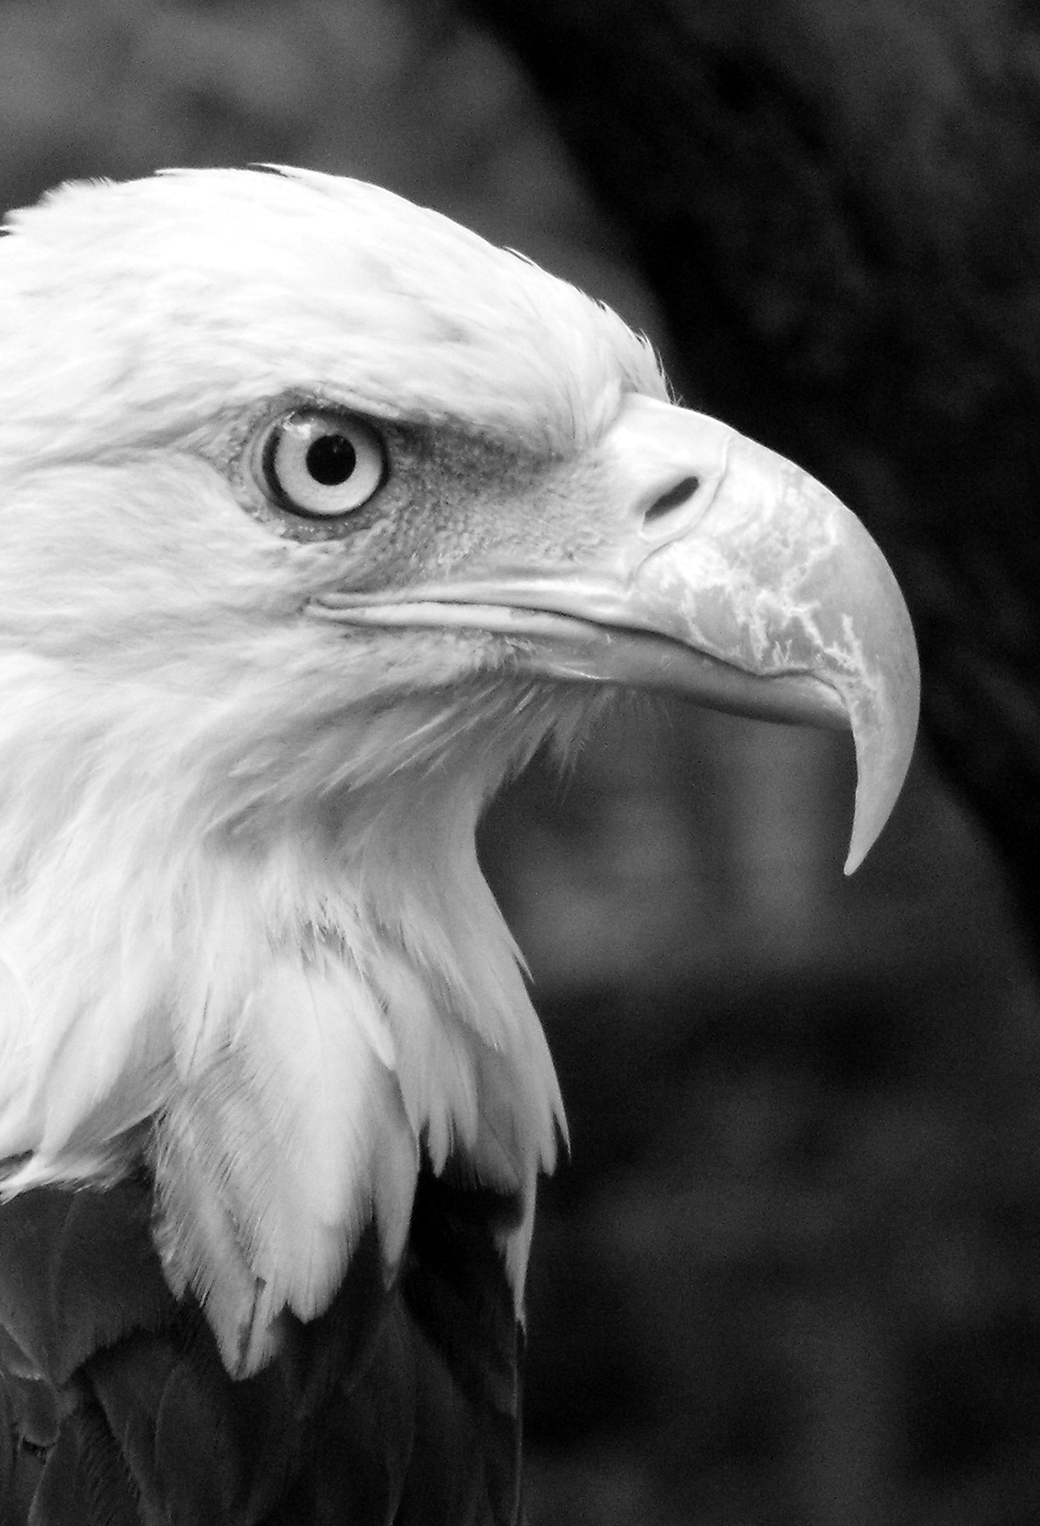 Black White Eagle 3Wallpapers Iphone Parallax Black & White Eagle